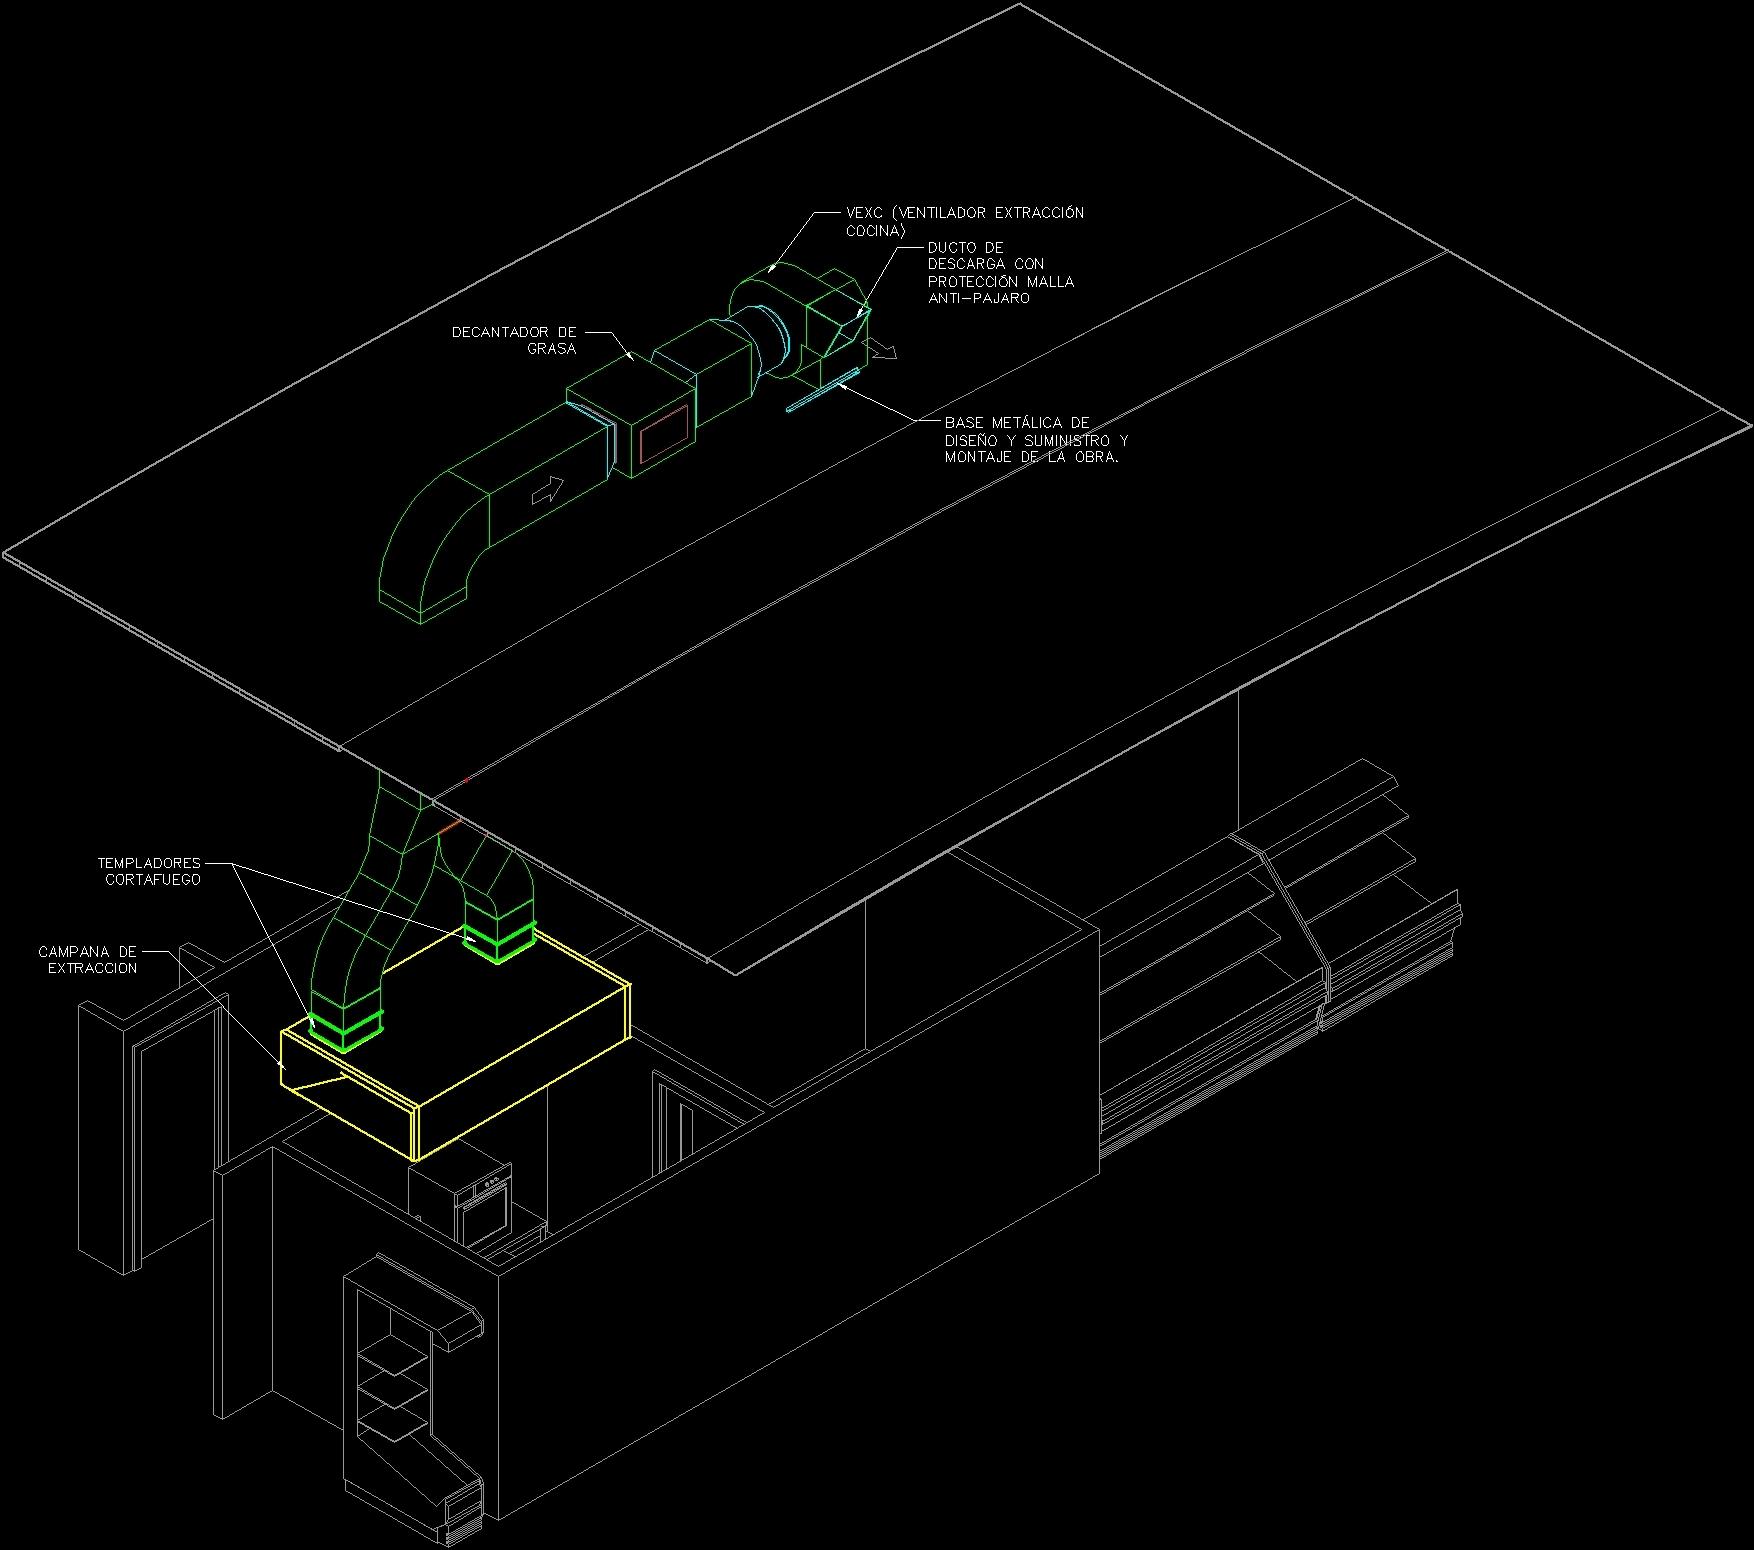 Industrial Kitchen Autocad Blocks: Industrial Kitchen Exhaust System Fat Extractors DWG